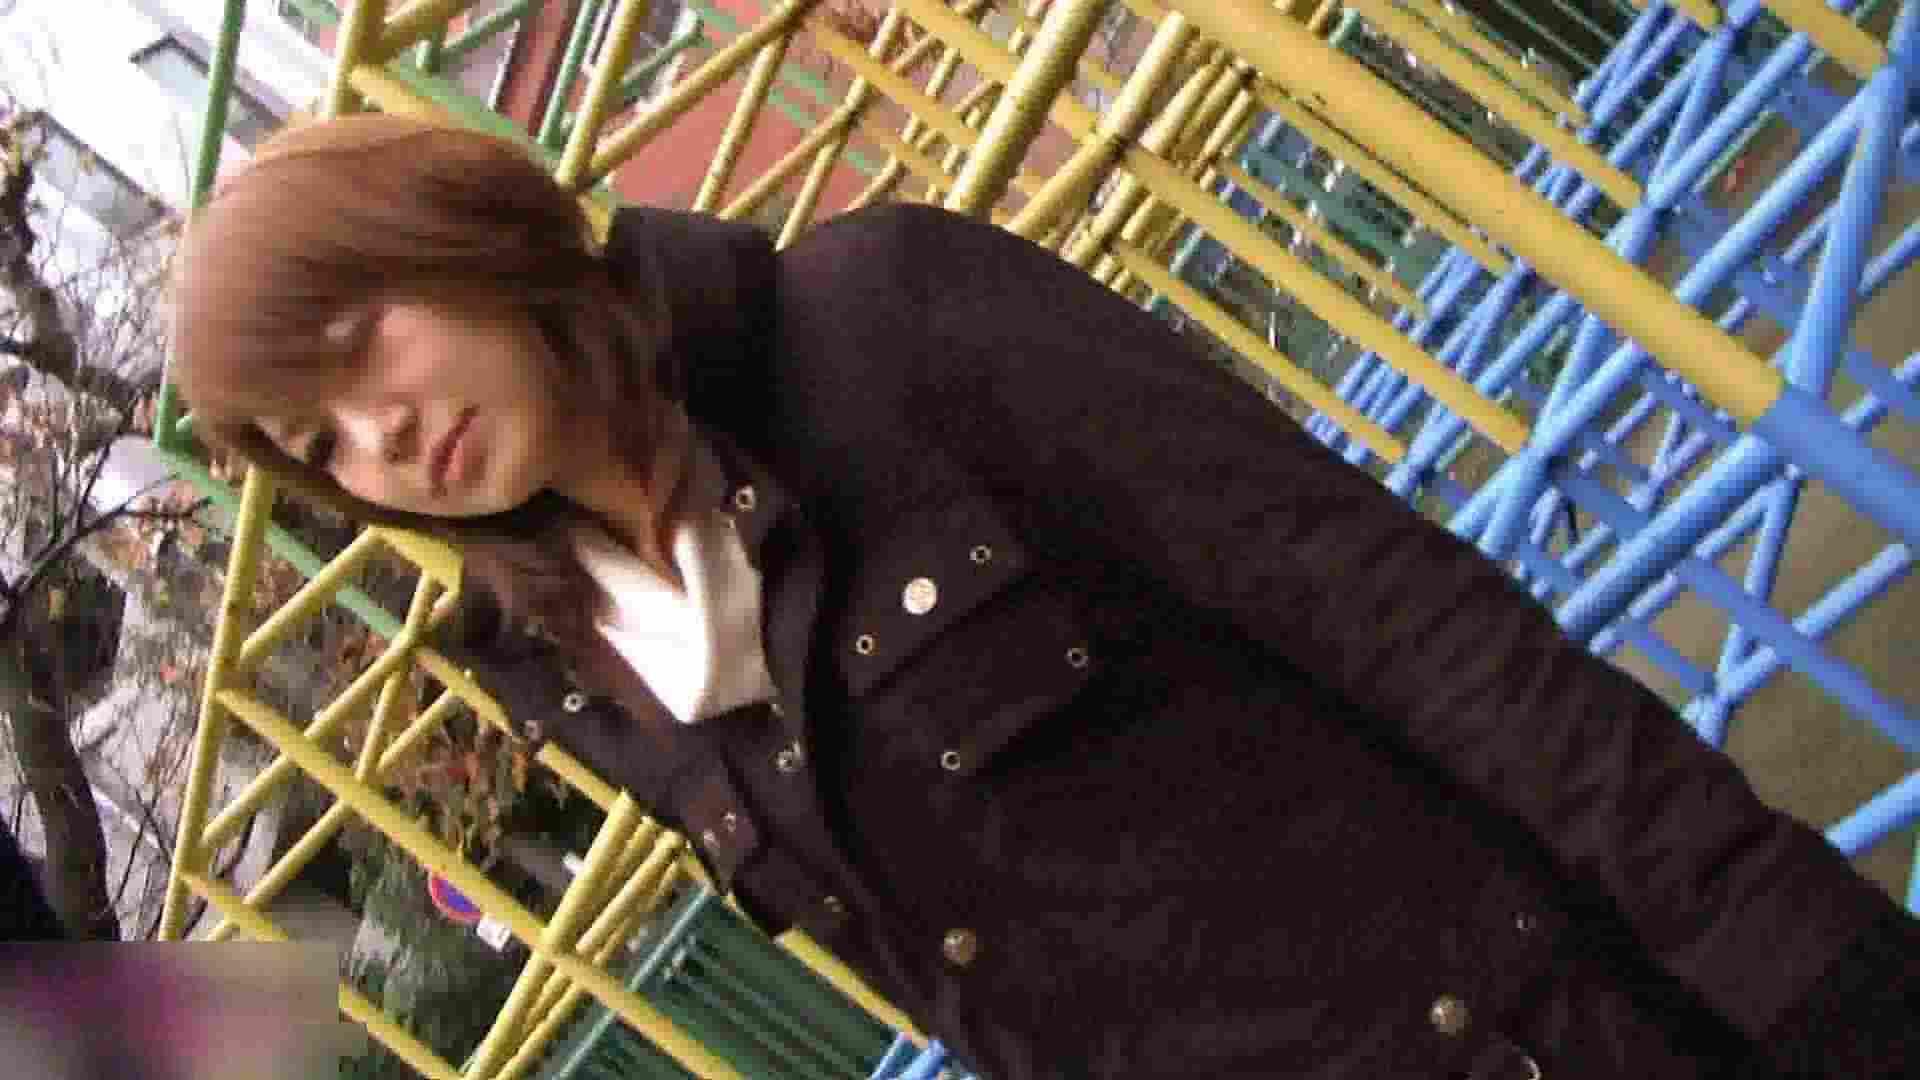 S級厳選美女ビッチガールVol.05 女子大生のヌード オマンコ無修正動画無料 78画像 3